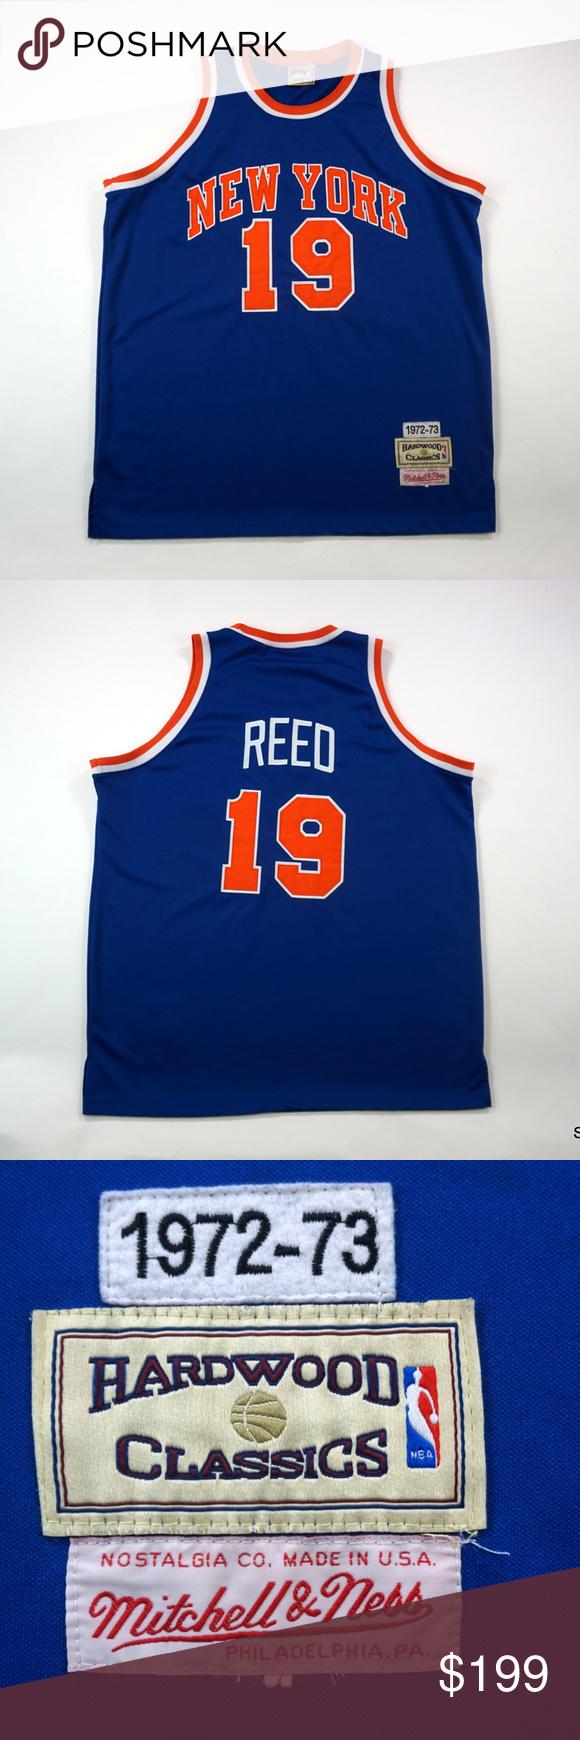 cheaper d58fa 73e16 New York Knicks Willis Reed Mitchell & Ness Jersey New York ...